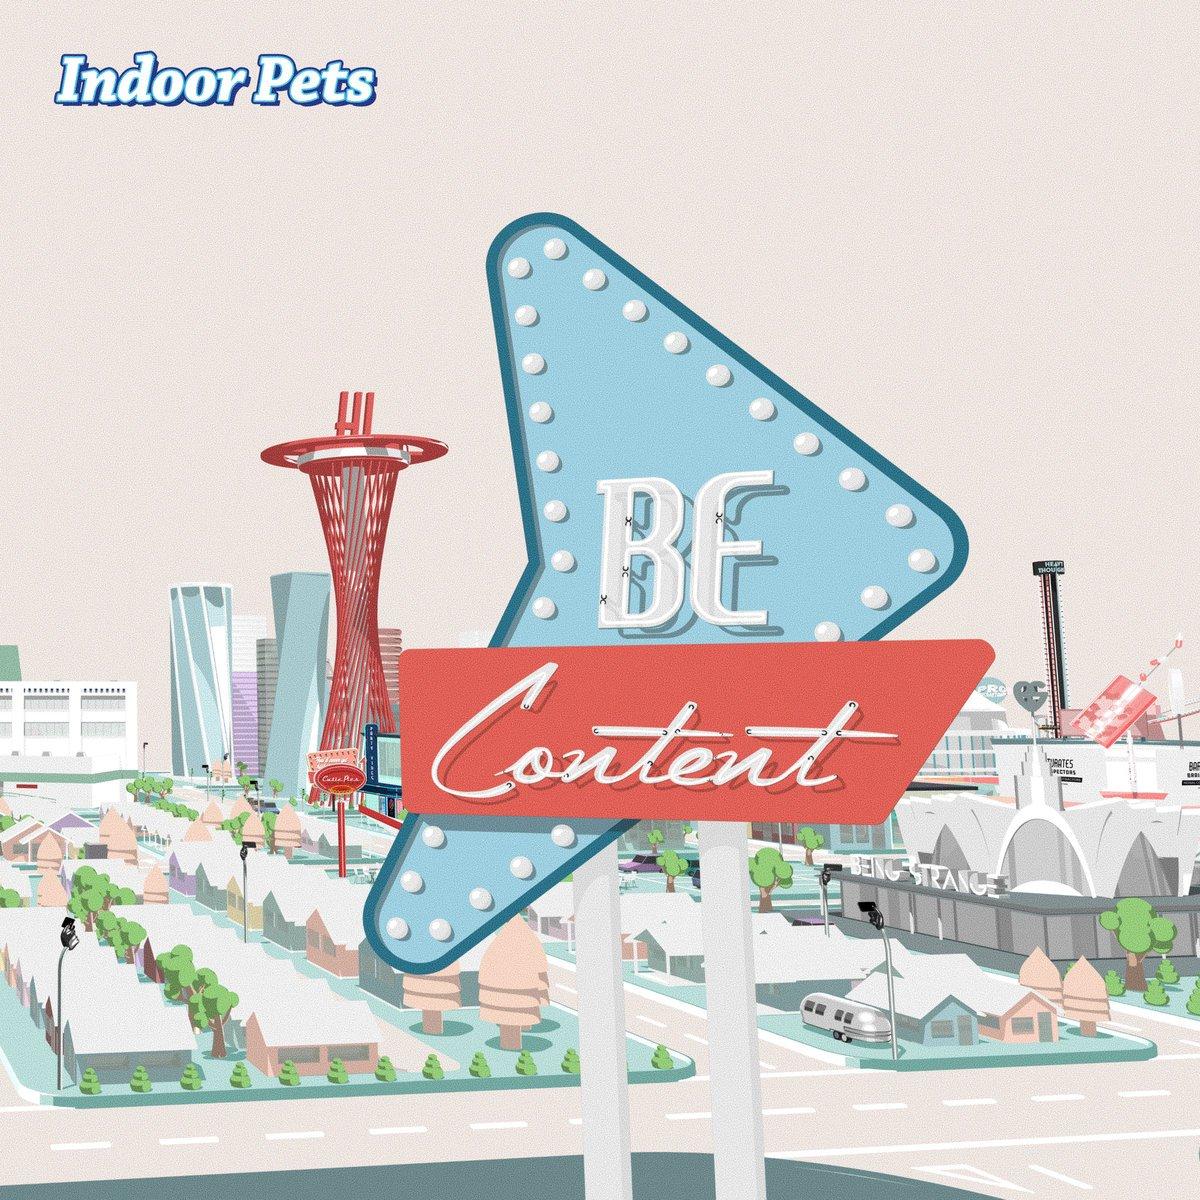 Stream @IndoorPets's debut album, 'Be Content' now 🎉🎉🎉 #TGE19 spoti.fi/2TEsq6C